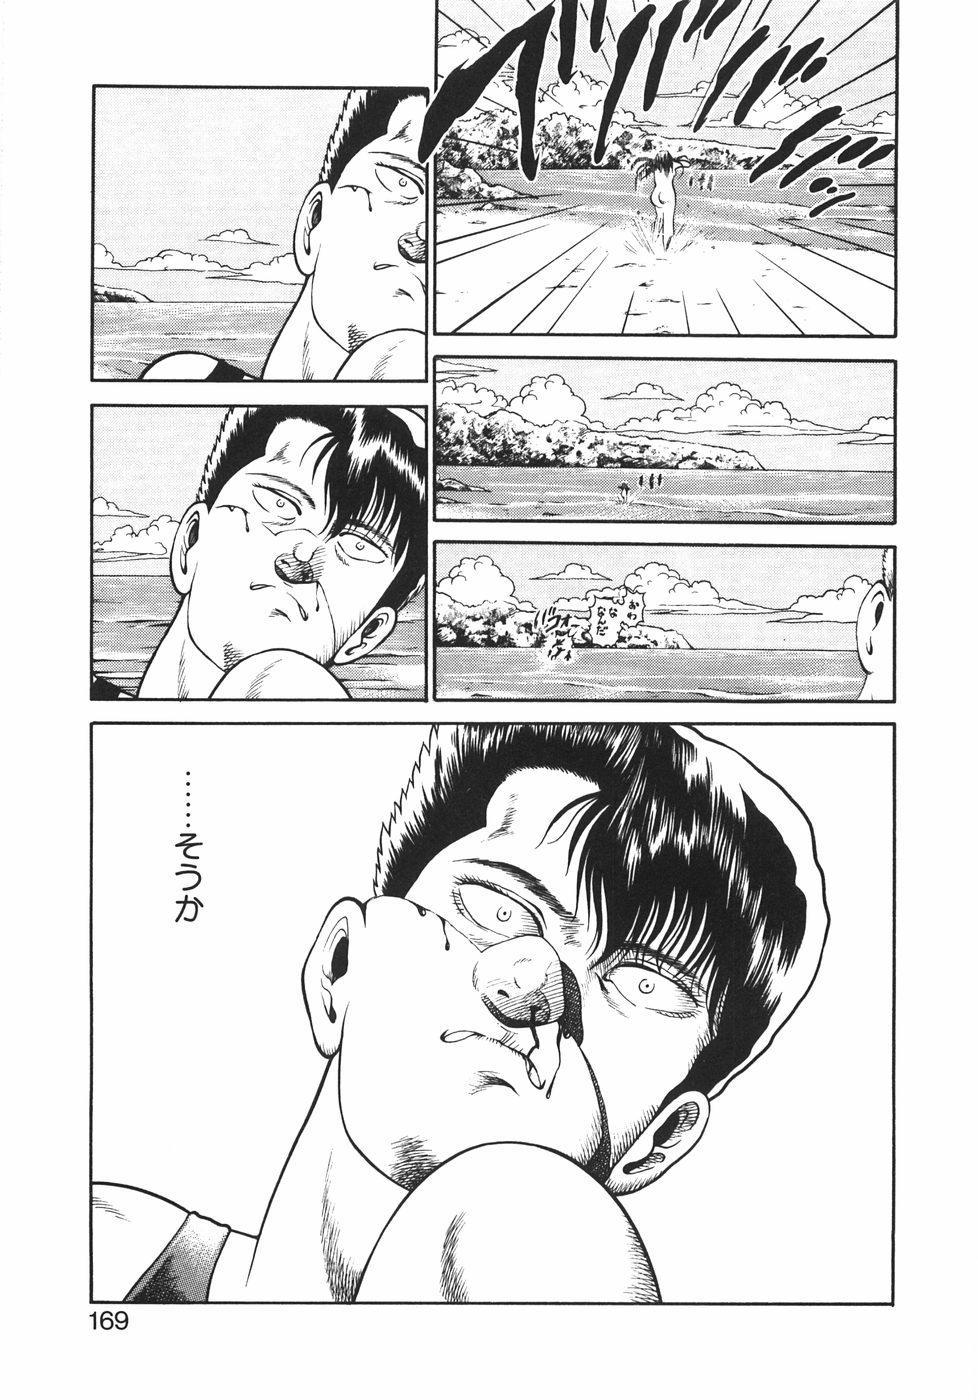 Dangerous Beach 174